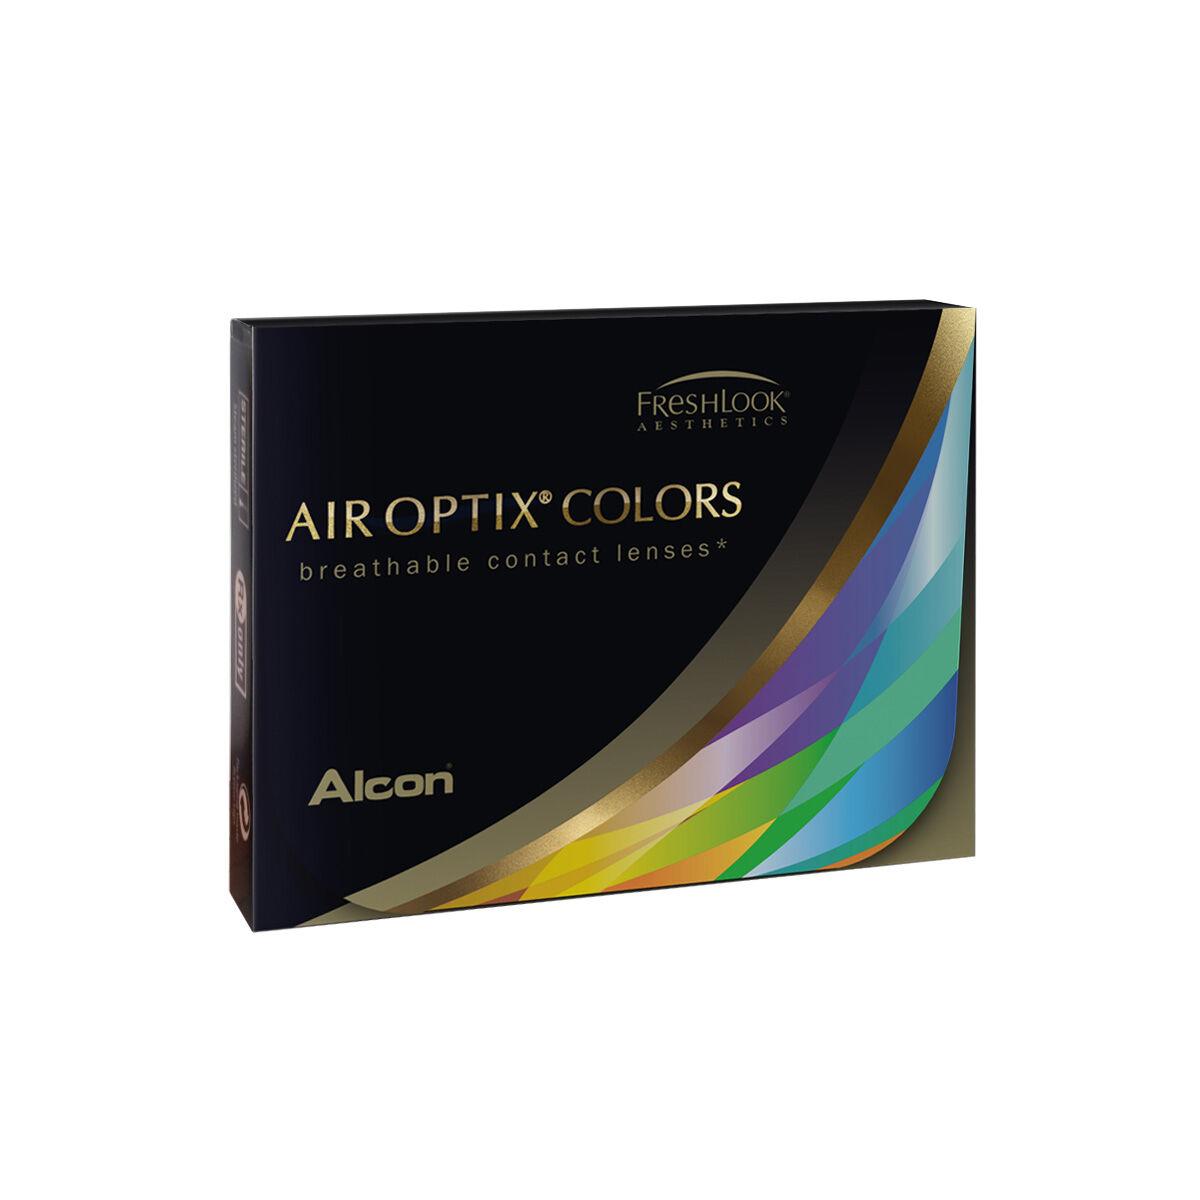 Alcon Air Optix Colors (2 Contact Lenses), Ciba Vision/Alcon, Monthly Coloured Lenses, Lotrafilcon B